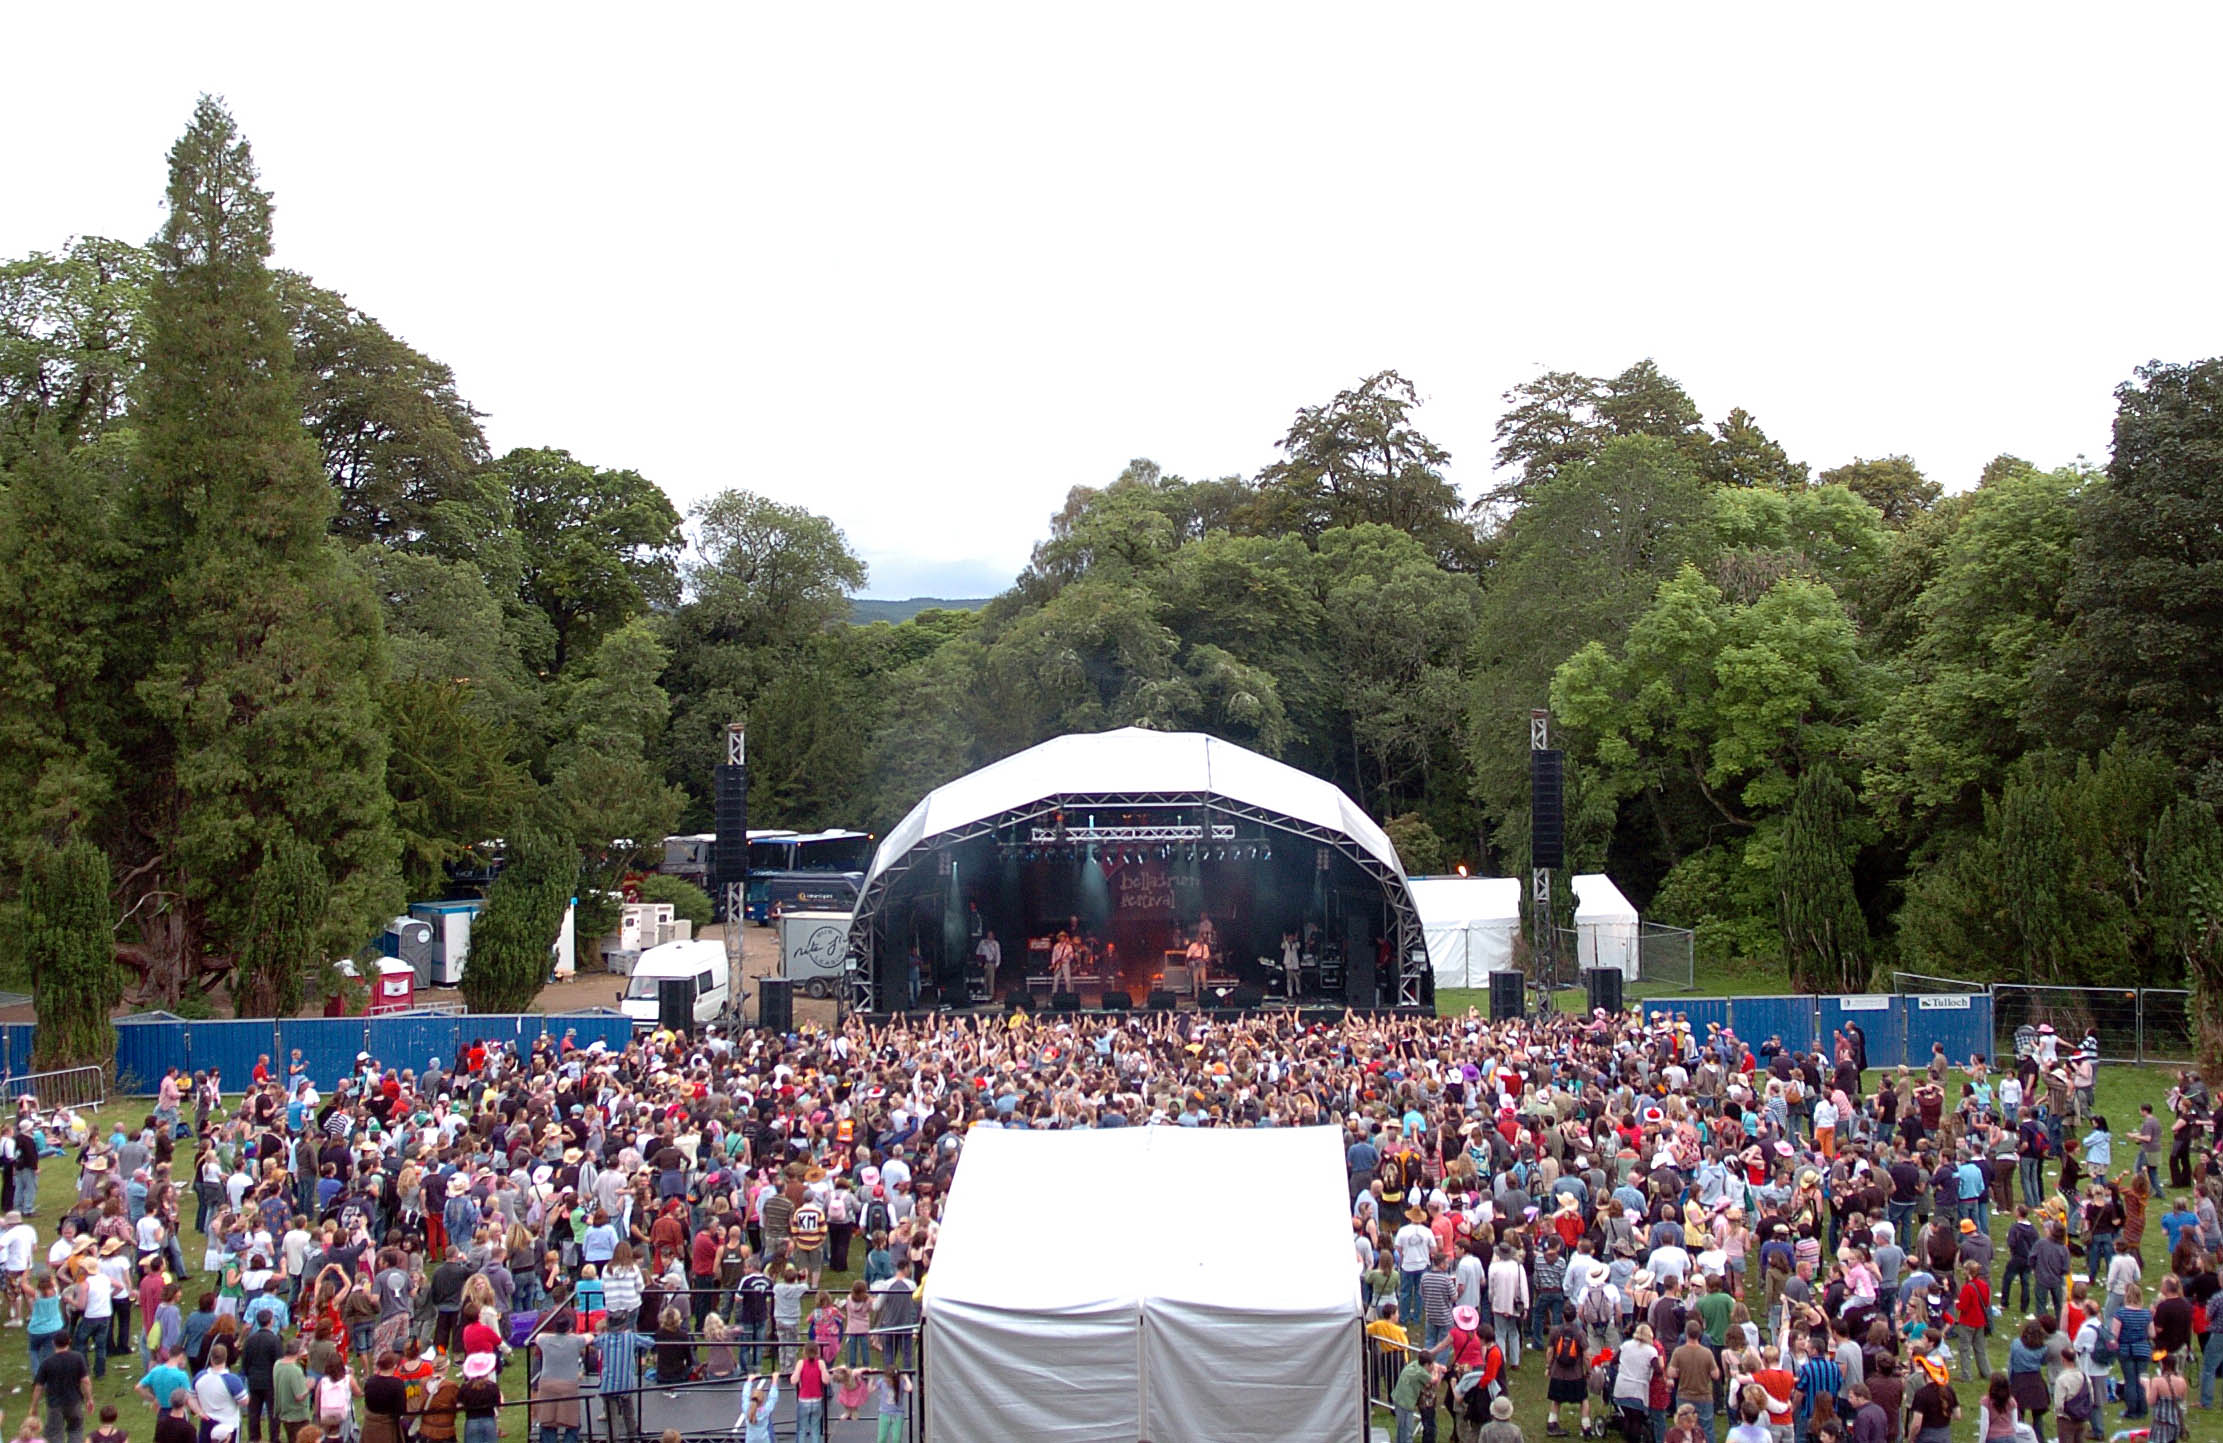 Belladrum's Garden stage. Picture by Andrew Duke.